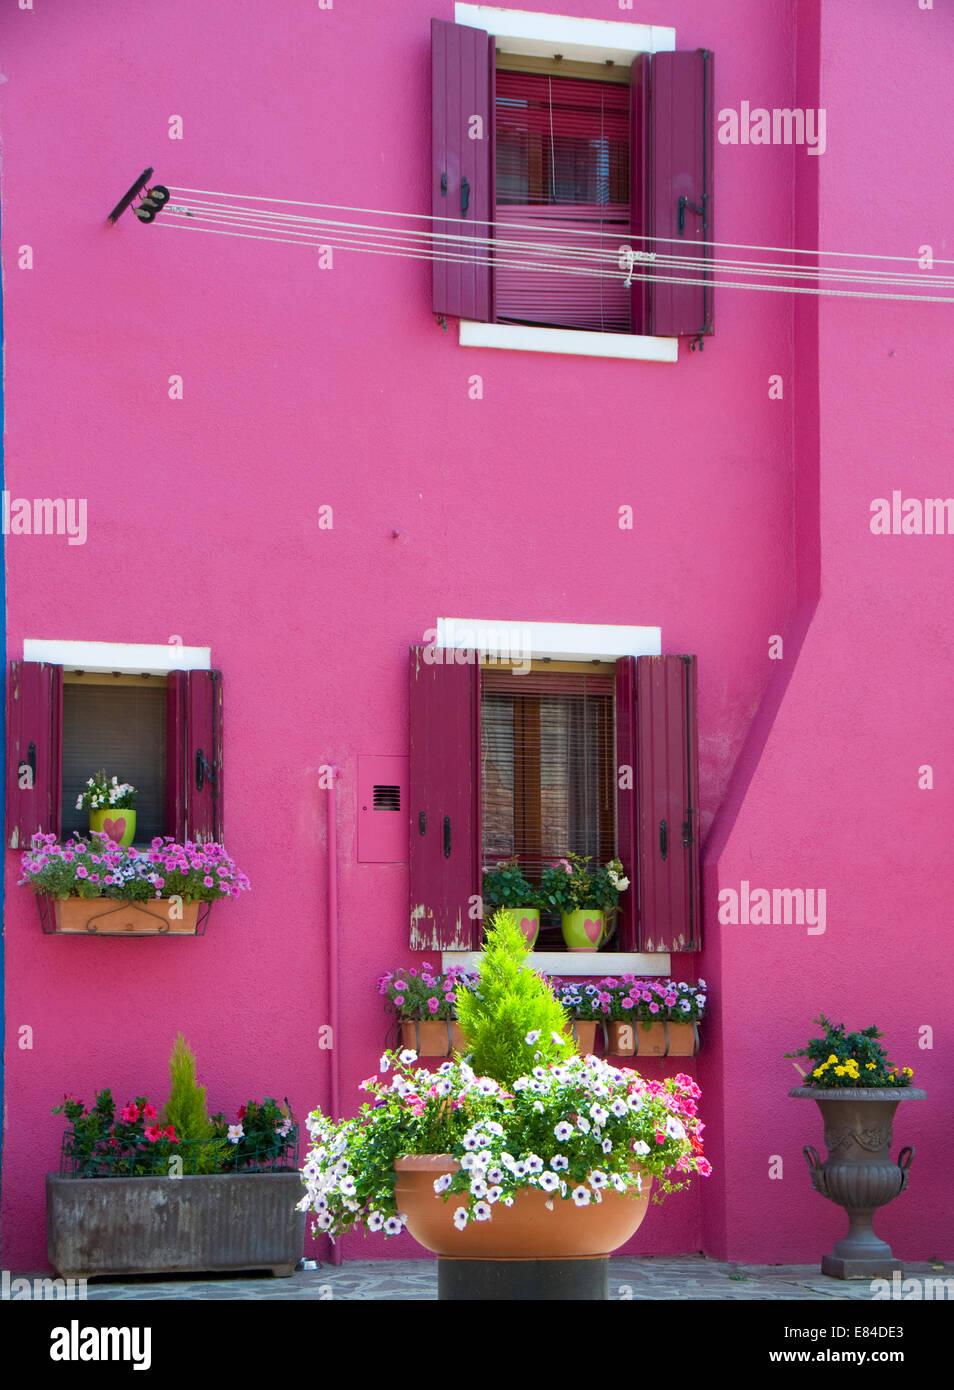 Burano Purple Wall Color House Stock Photos & Burano Purple Wall ...